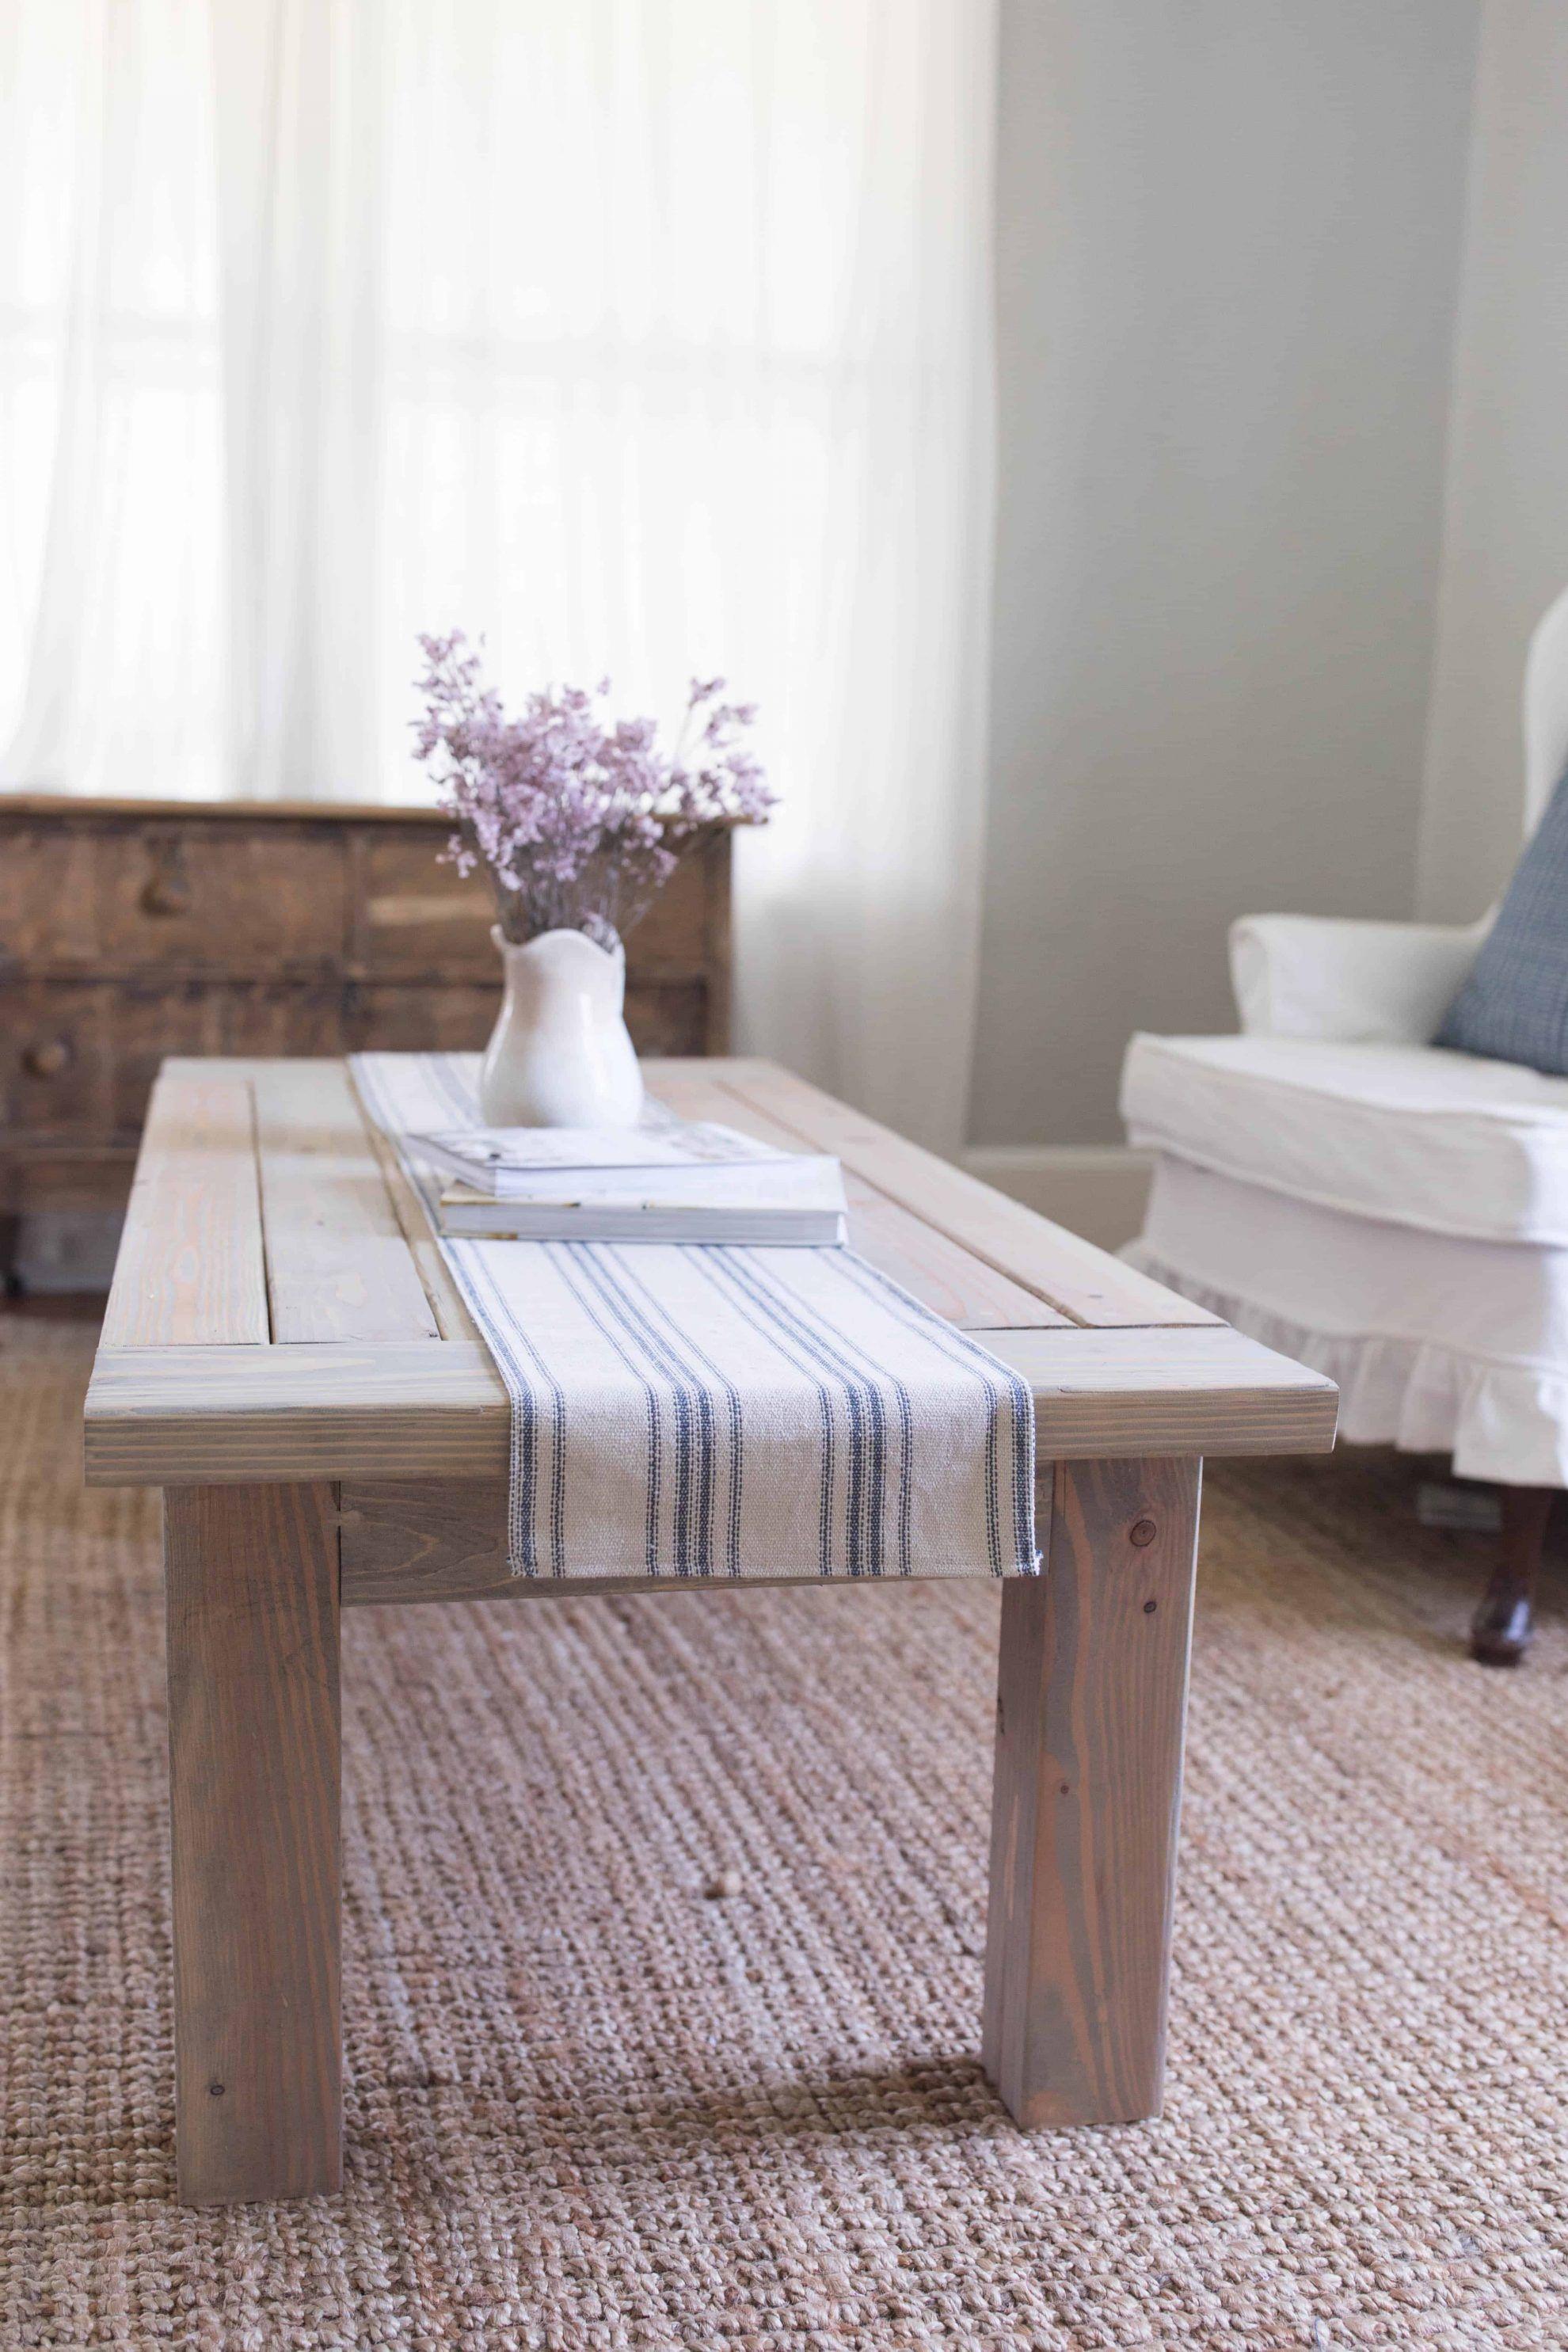 DIY Farmhouse Coffee Table Plans Diy farmhouse coffee